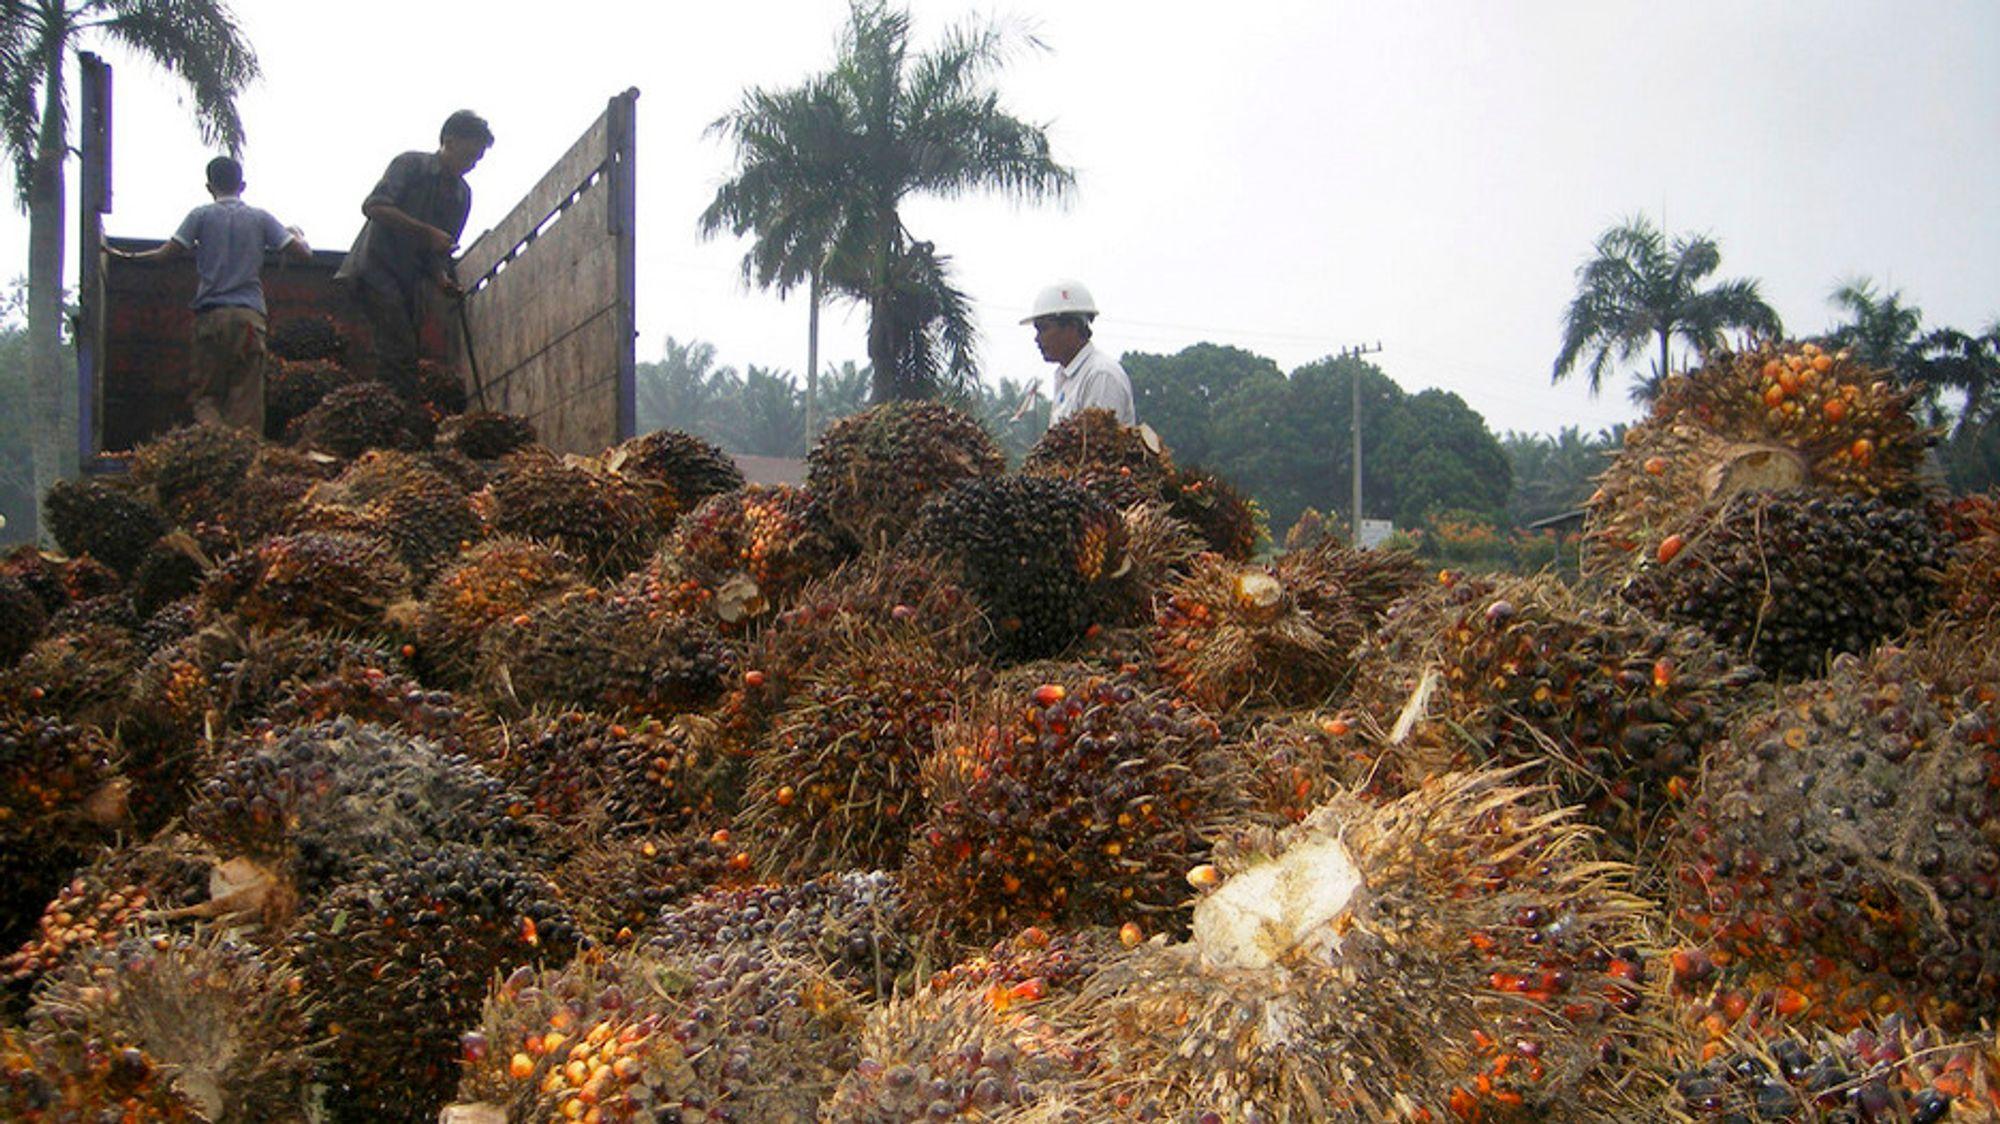 TU LIVE: Nesten halvparten av all palmeolje-bruk i EU er drivstoff